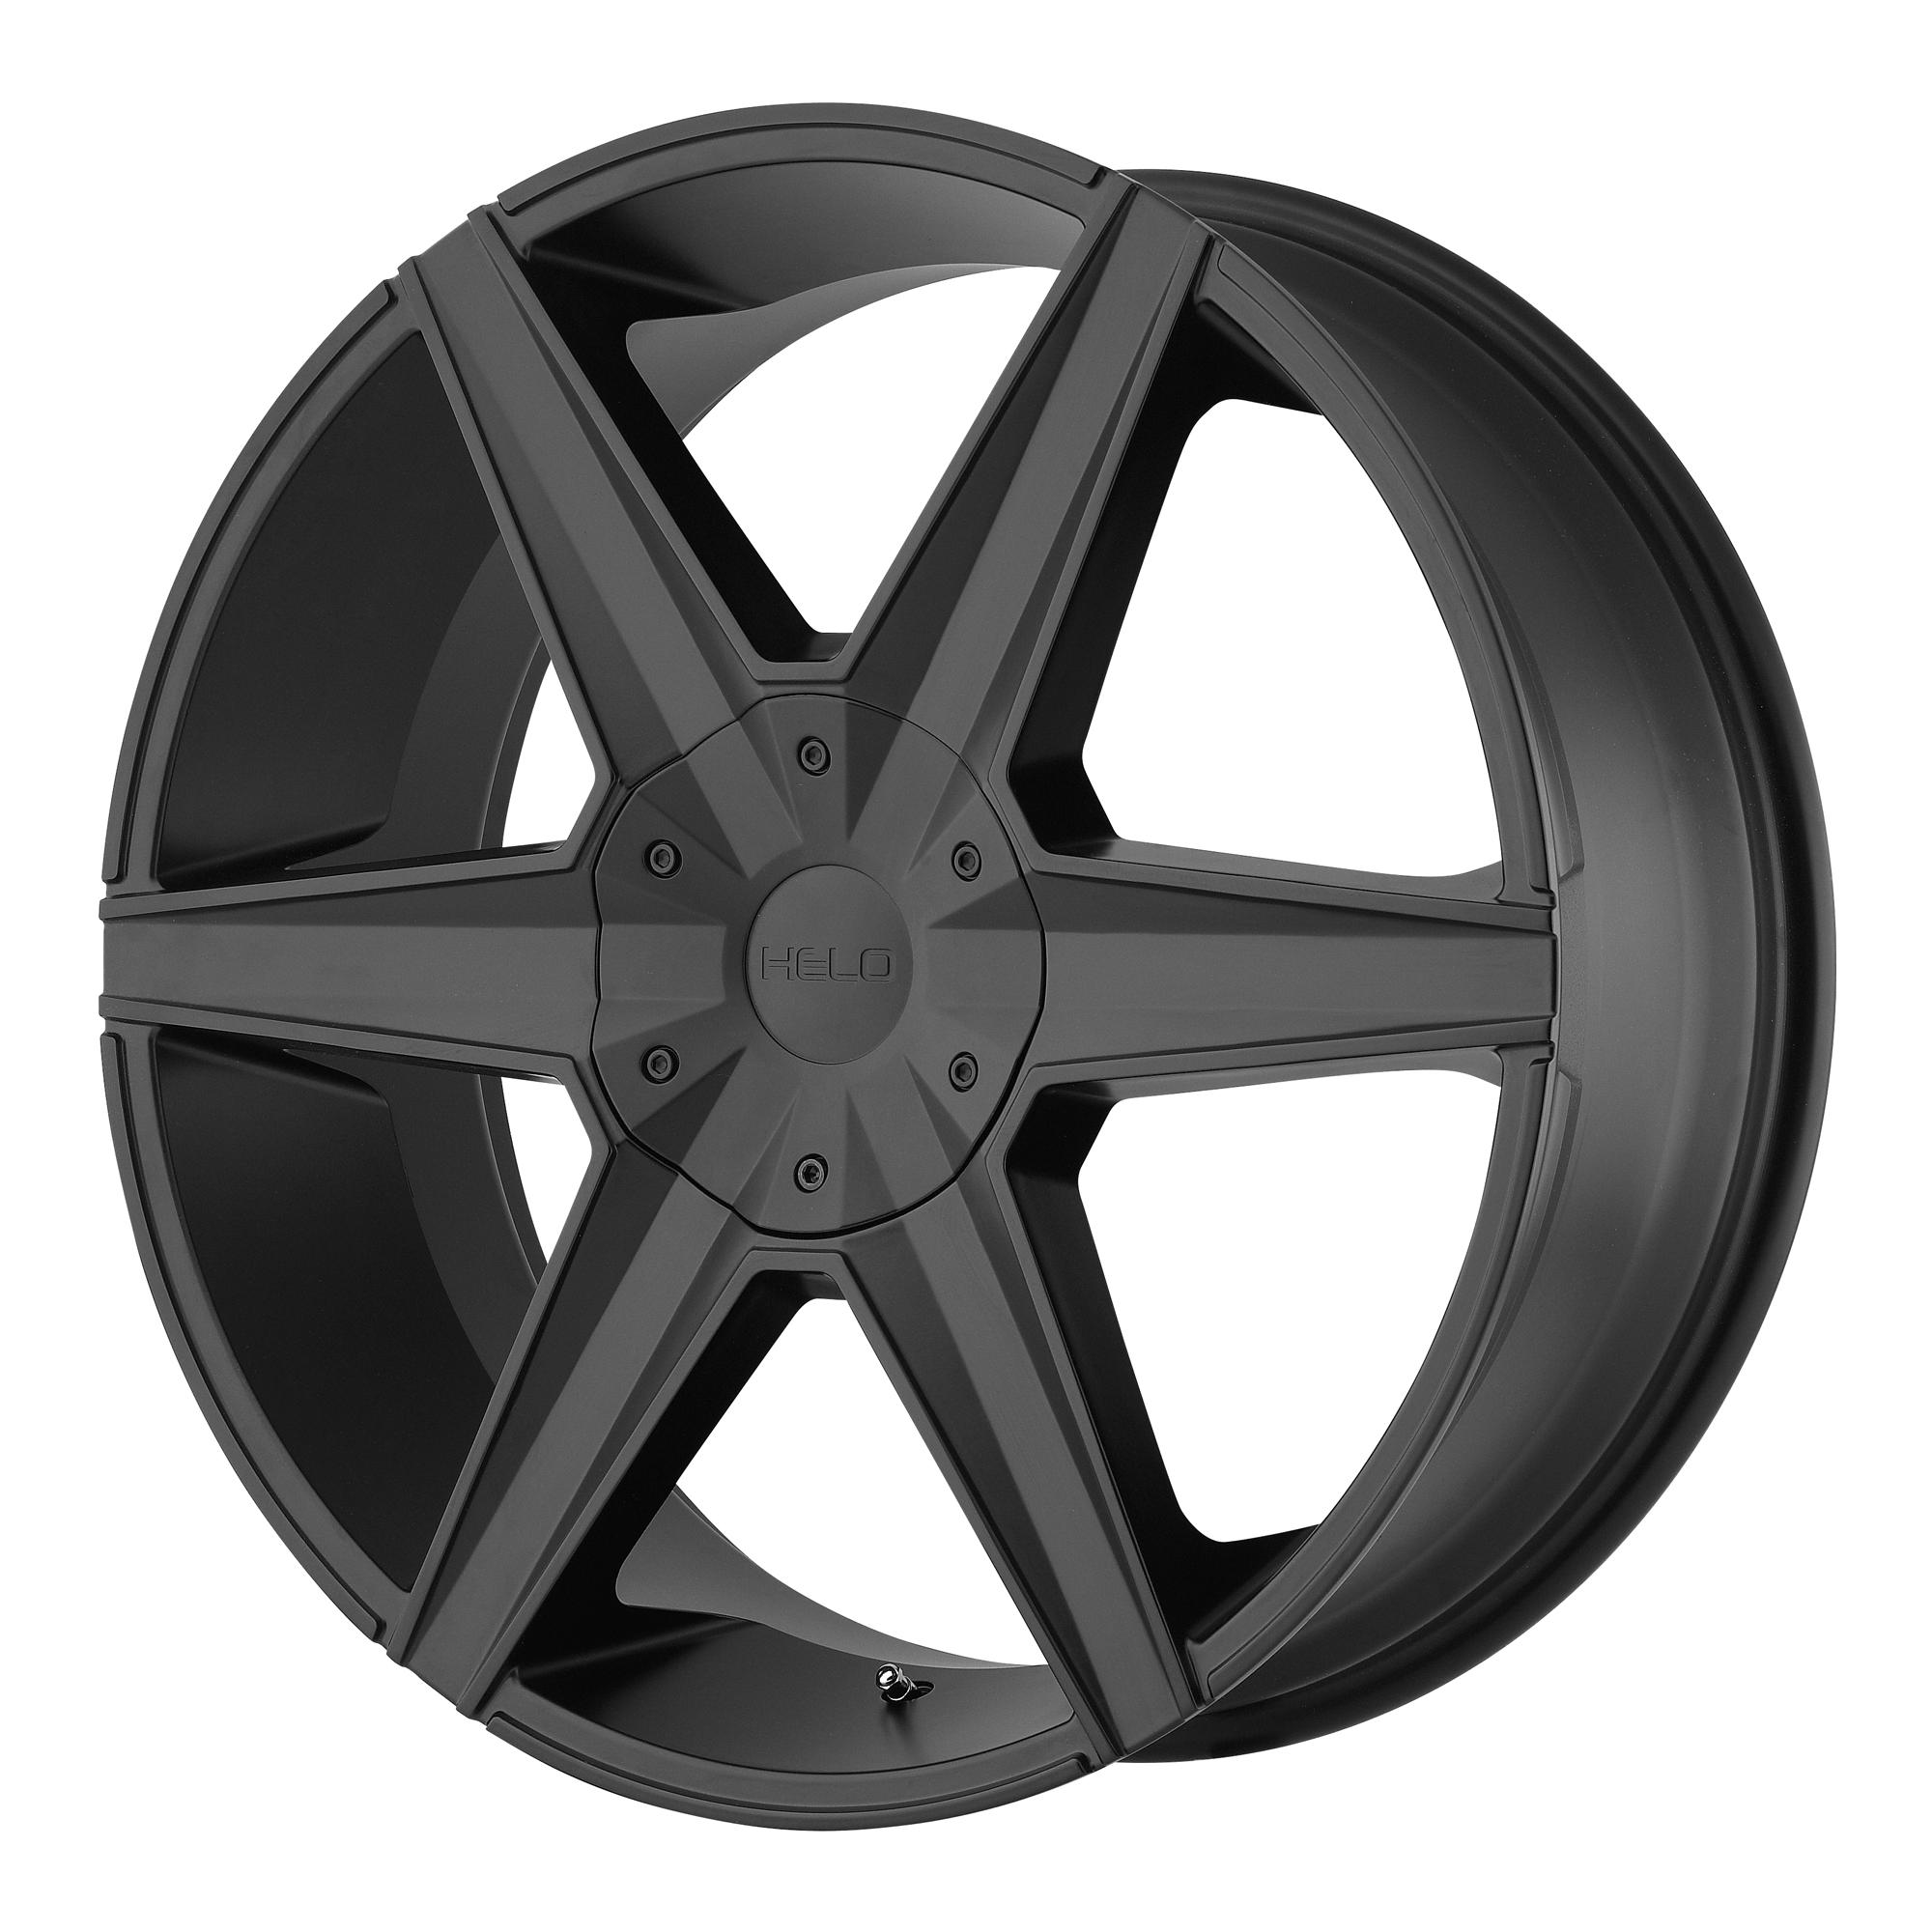 Helo Wheels HE887 Satin Black